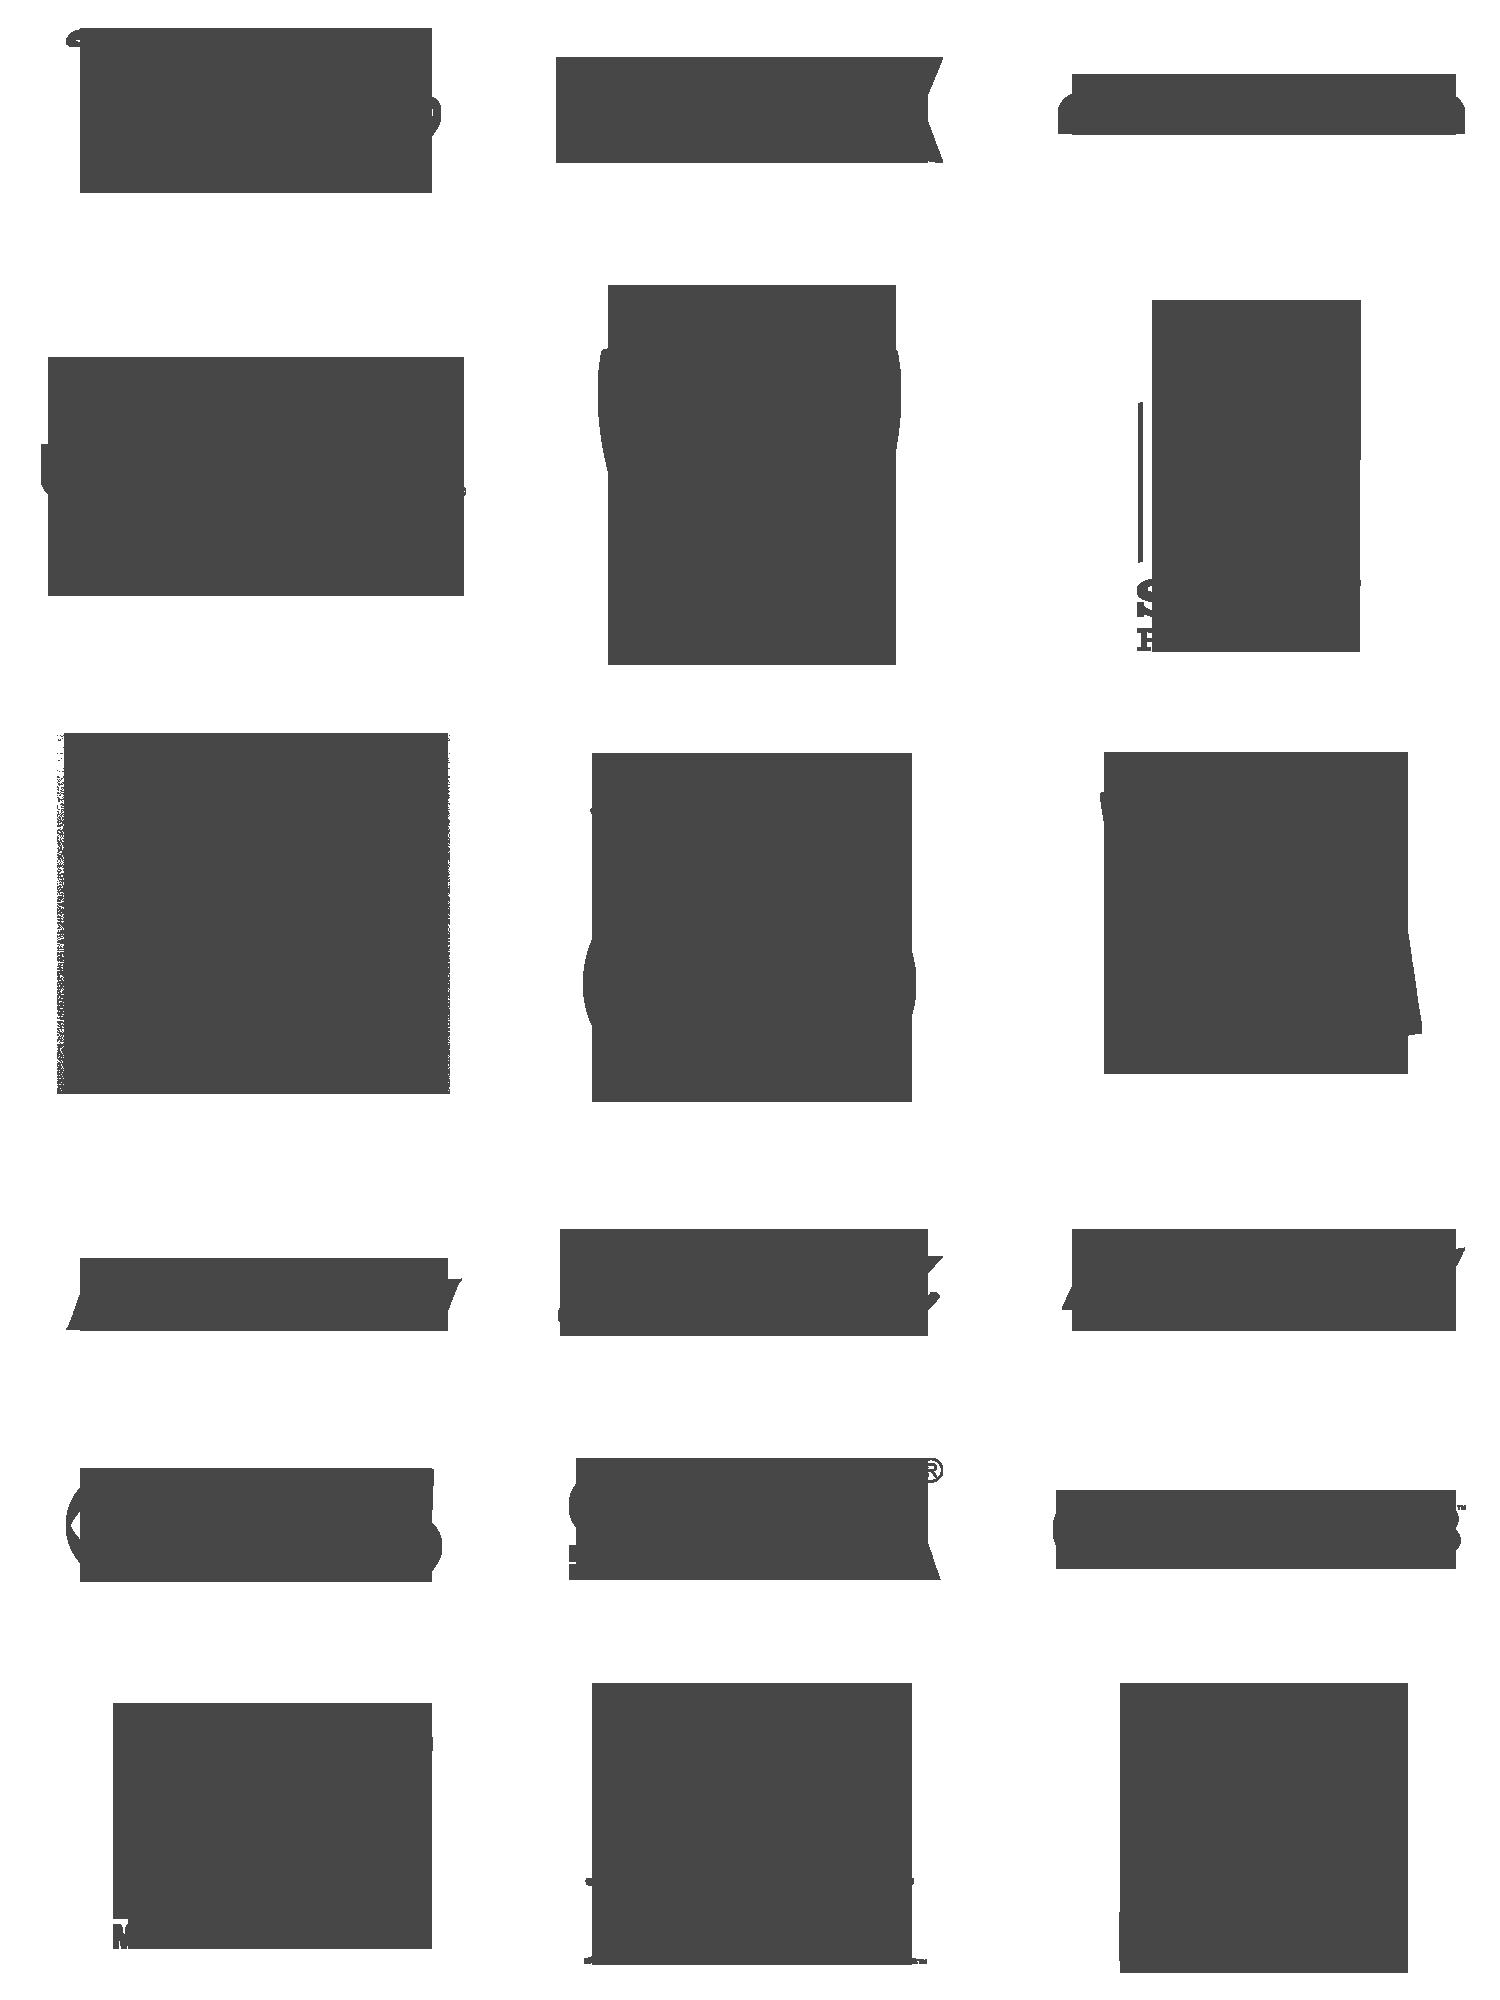 https://www.shirtstore.no/pub_docs/files/OfficialMerchandise/Lecensed_Logos.png